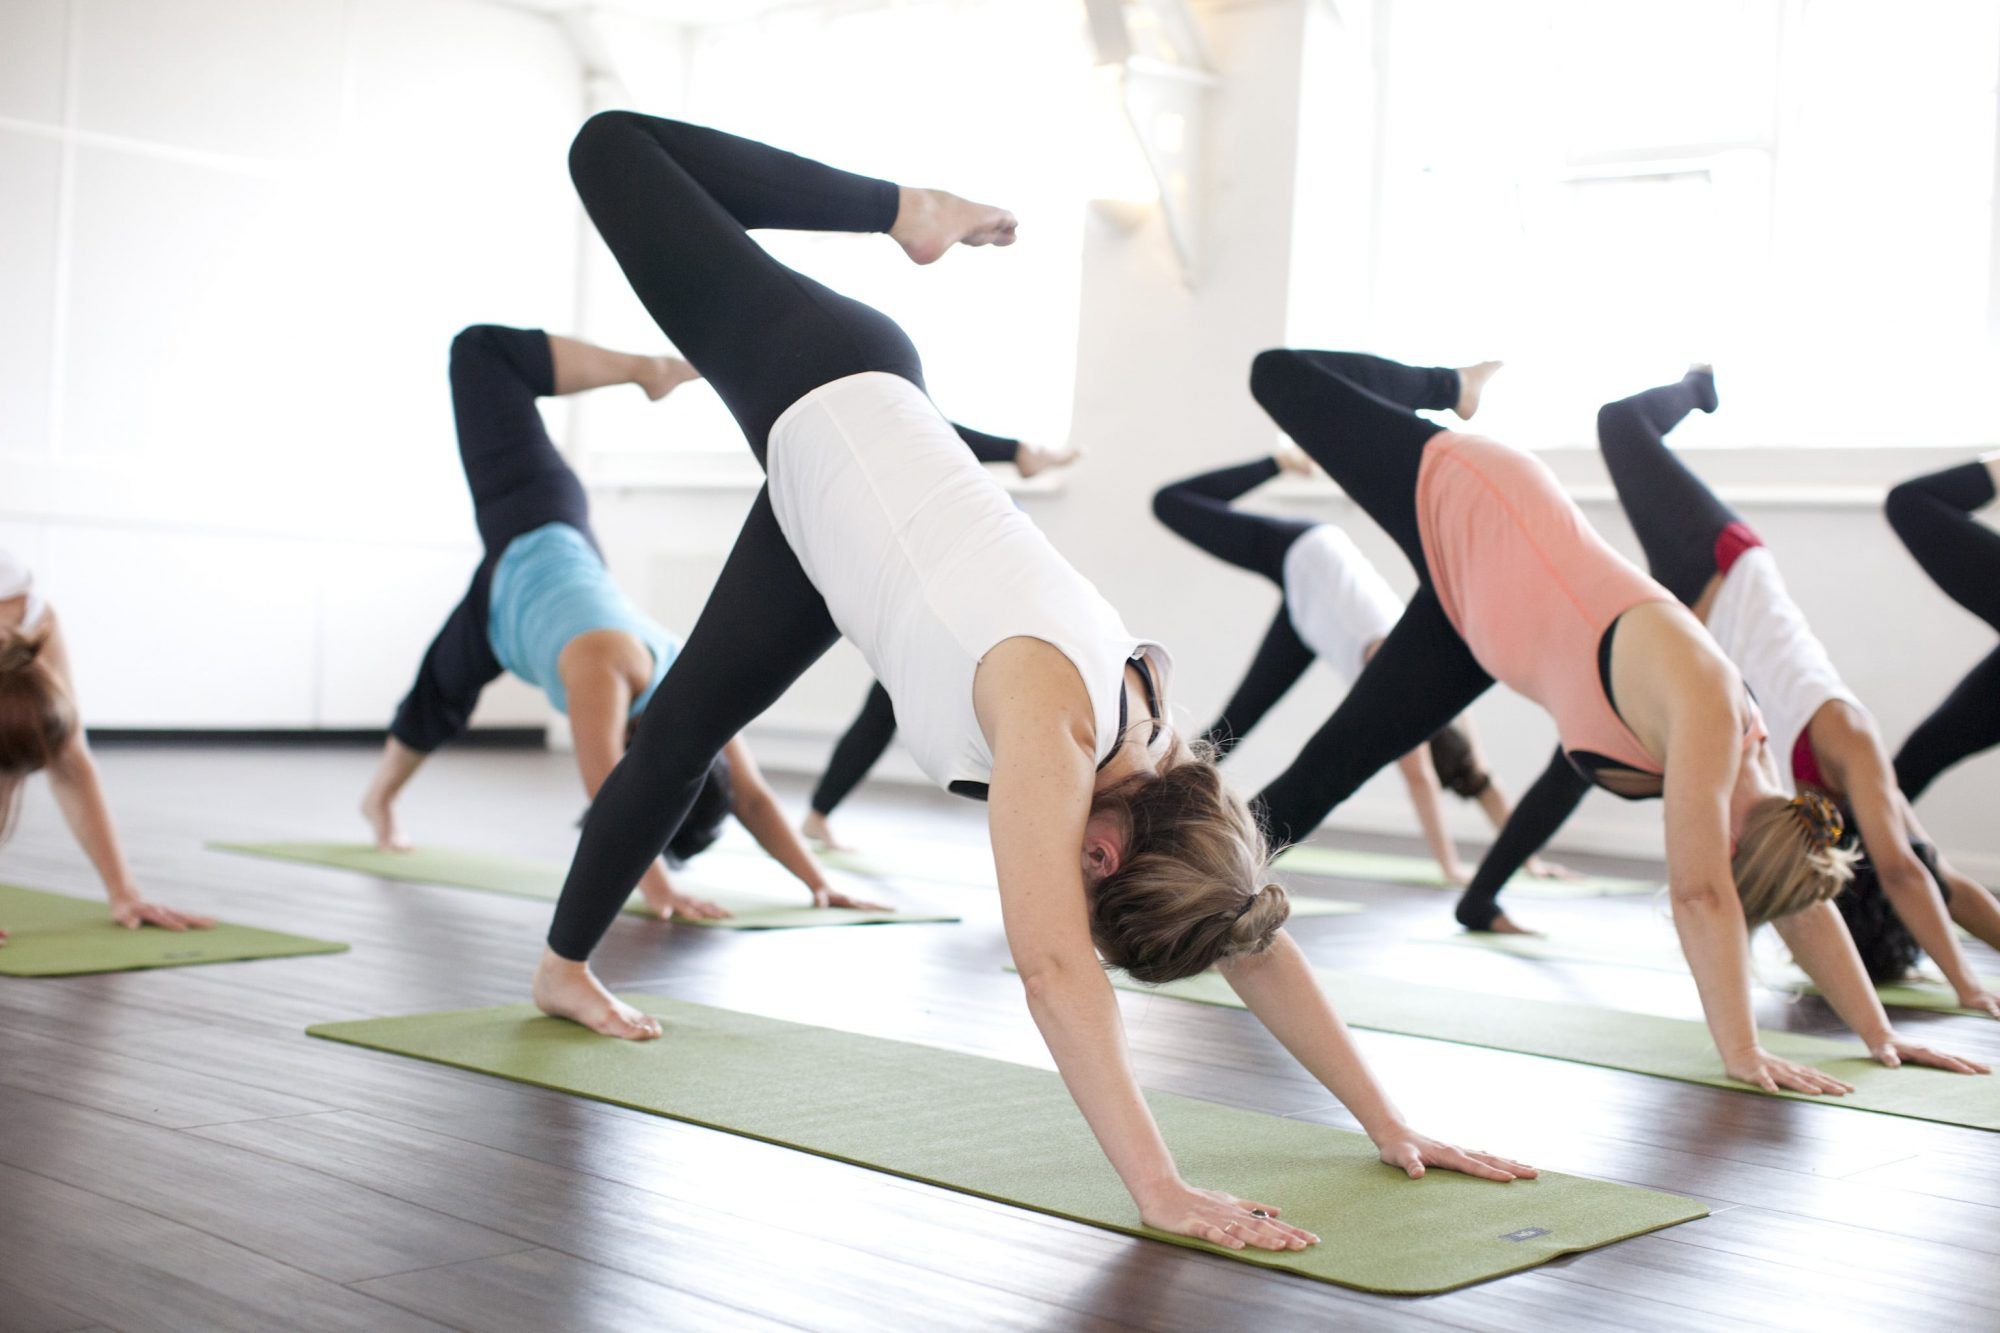 yoga downdog flip.jpg